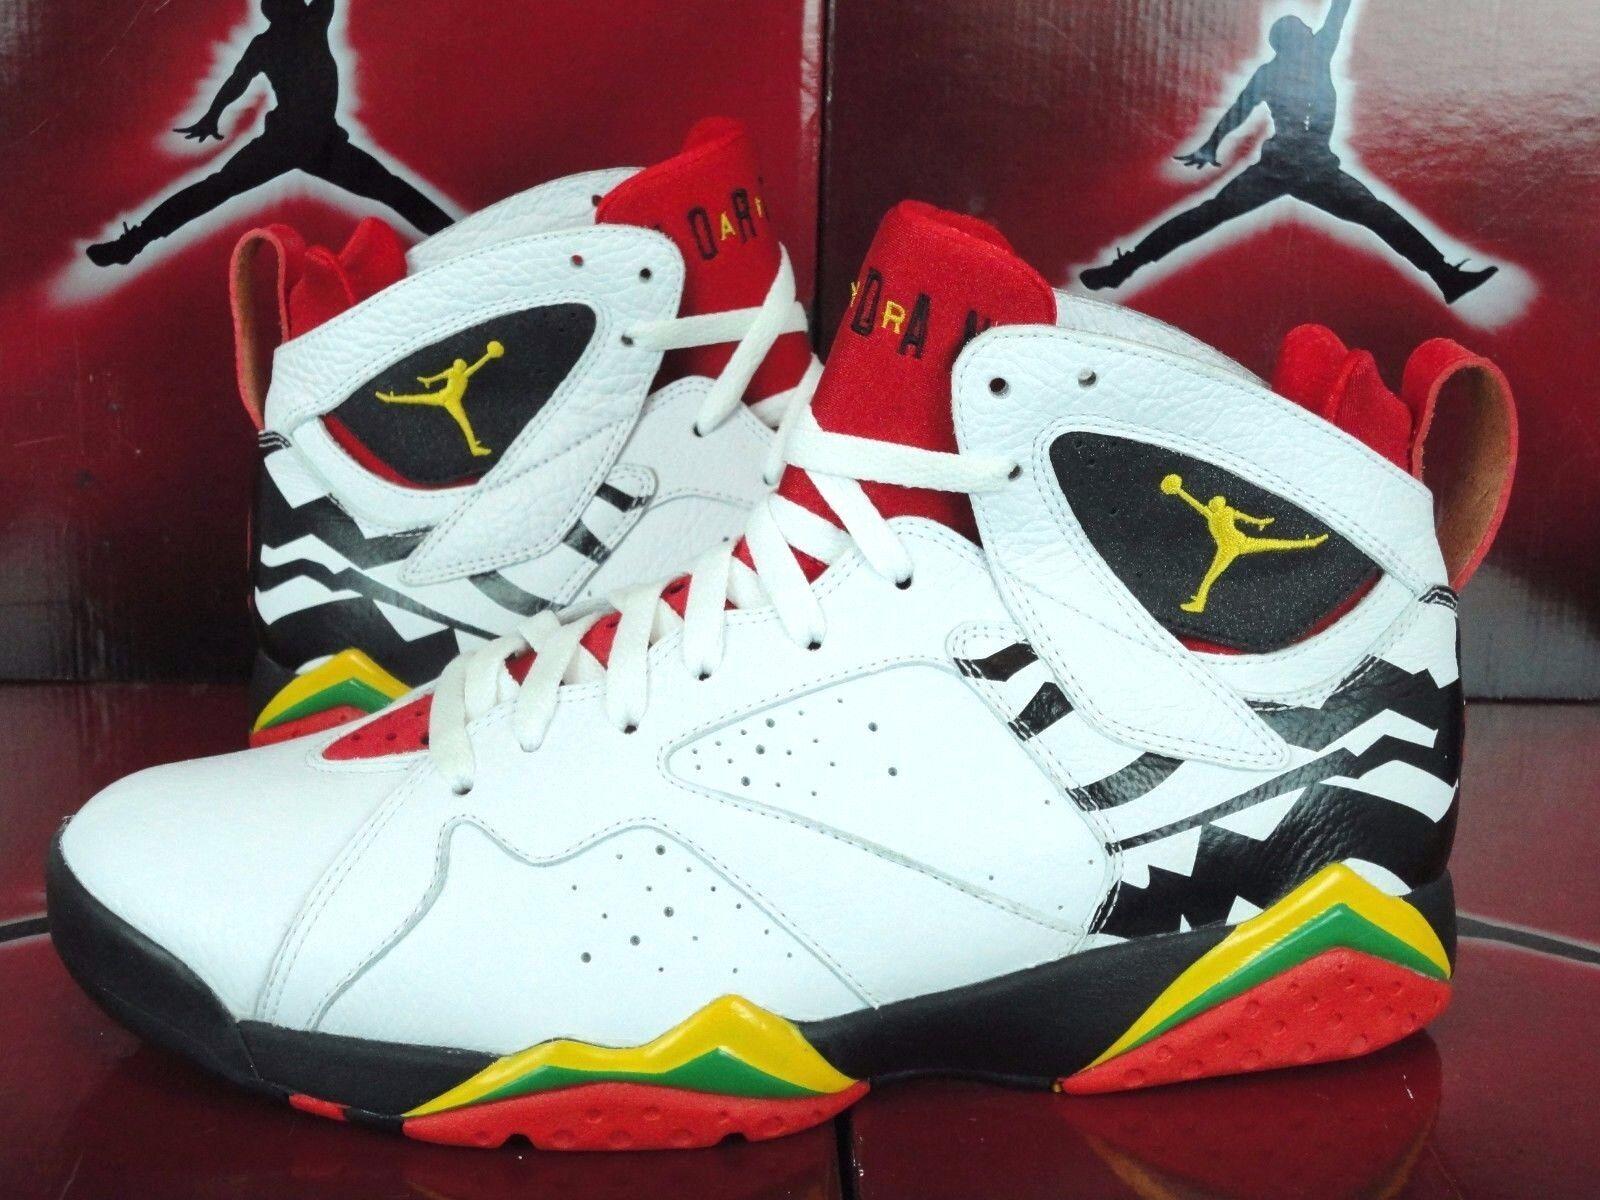 Nike Air Jordan VII 7 Retro PREMIO BIN WHITE 23 WHITE BIN RED BLACK 436206-101 11 cac1a6